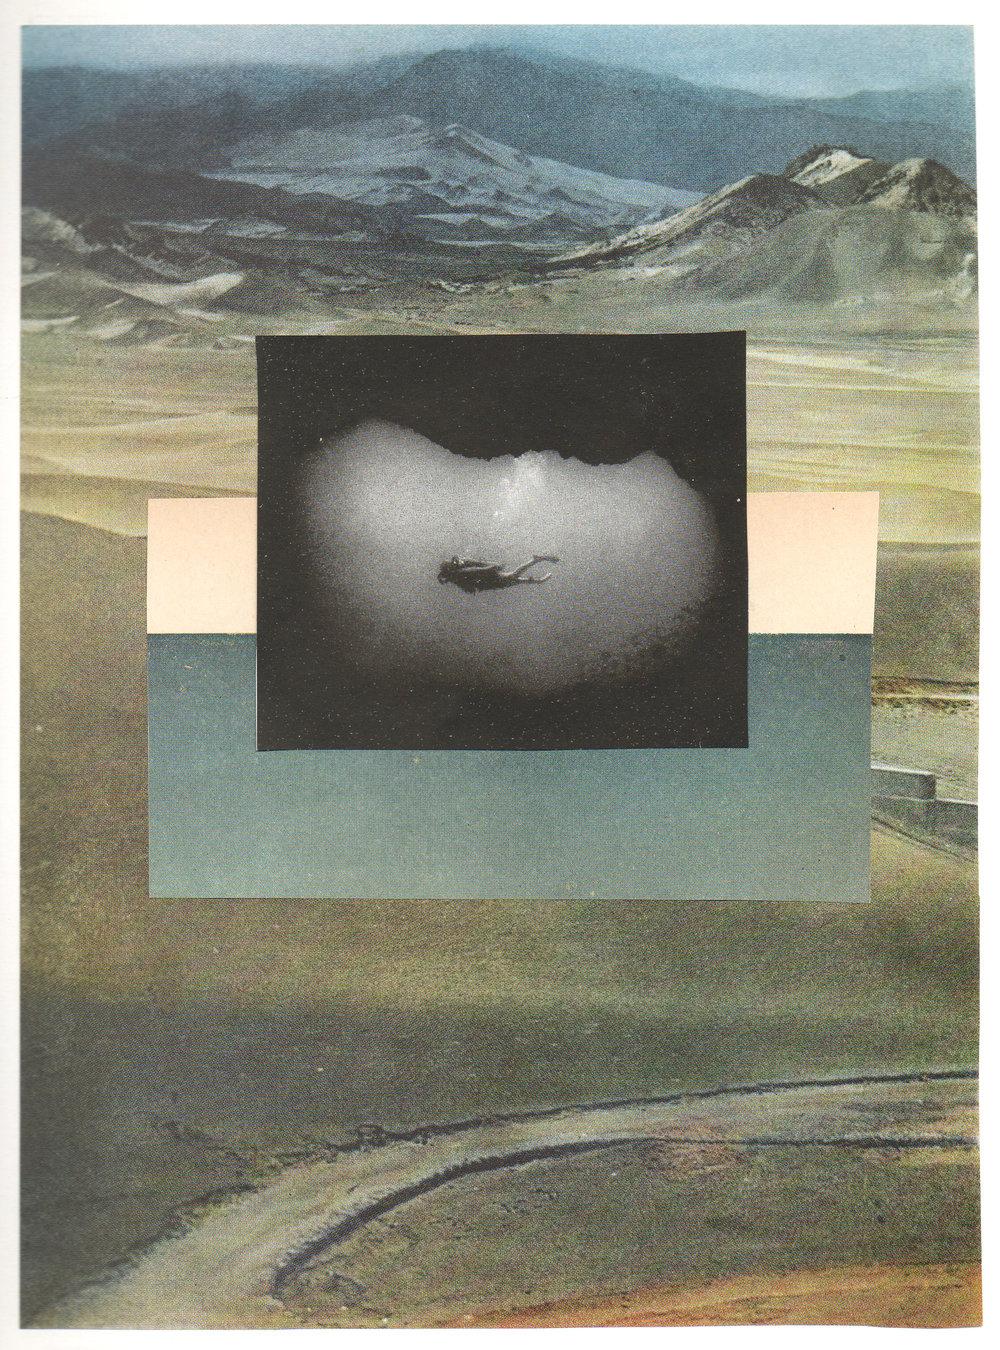 A DESERT SWIM | 2013